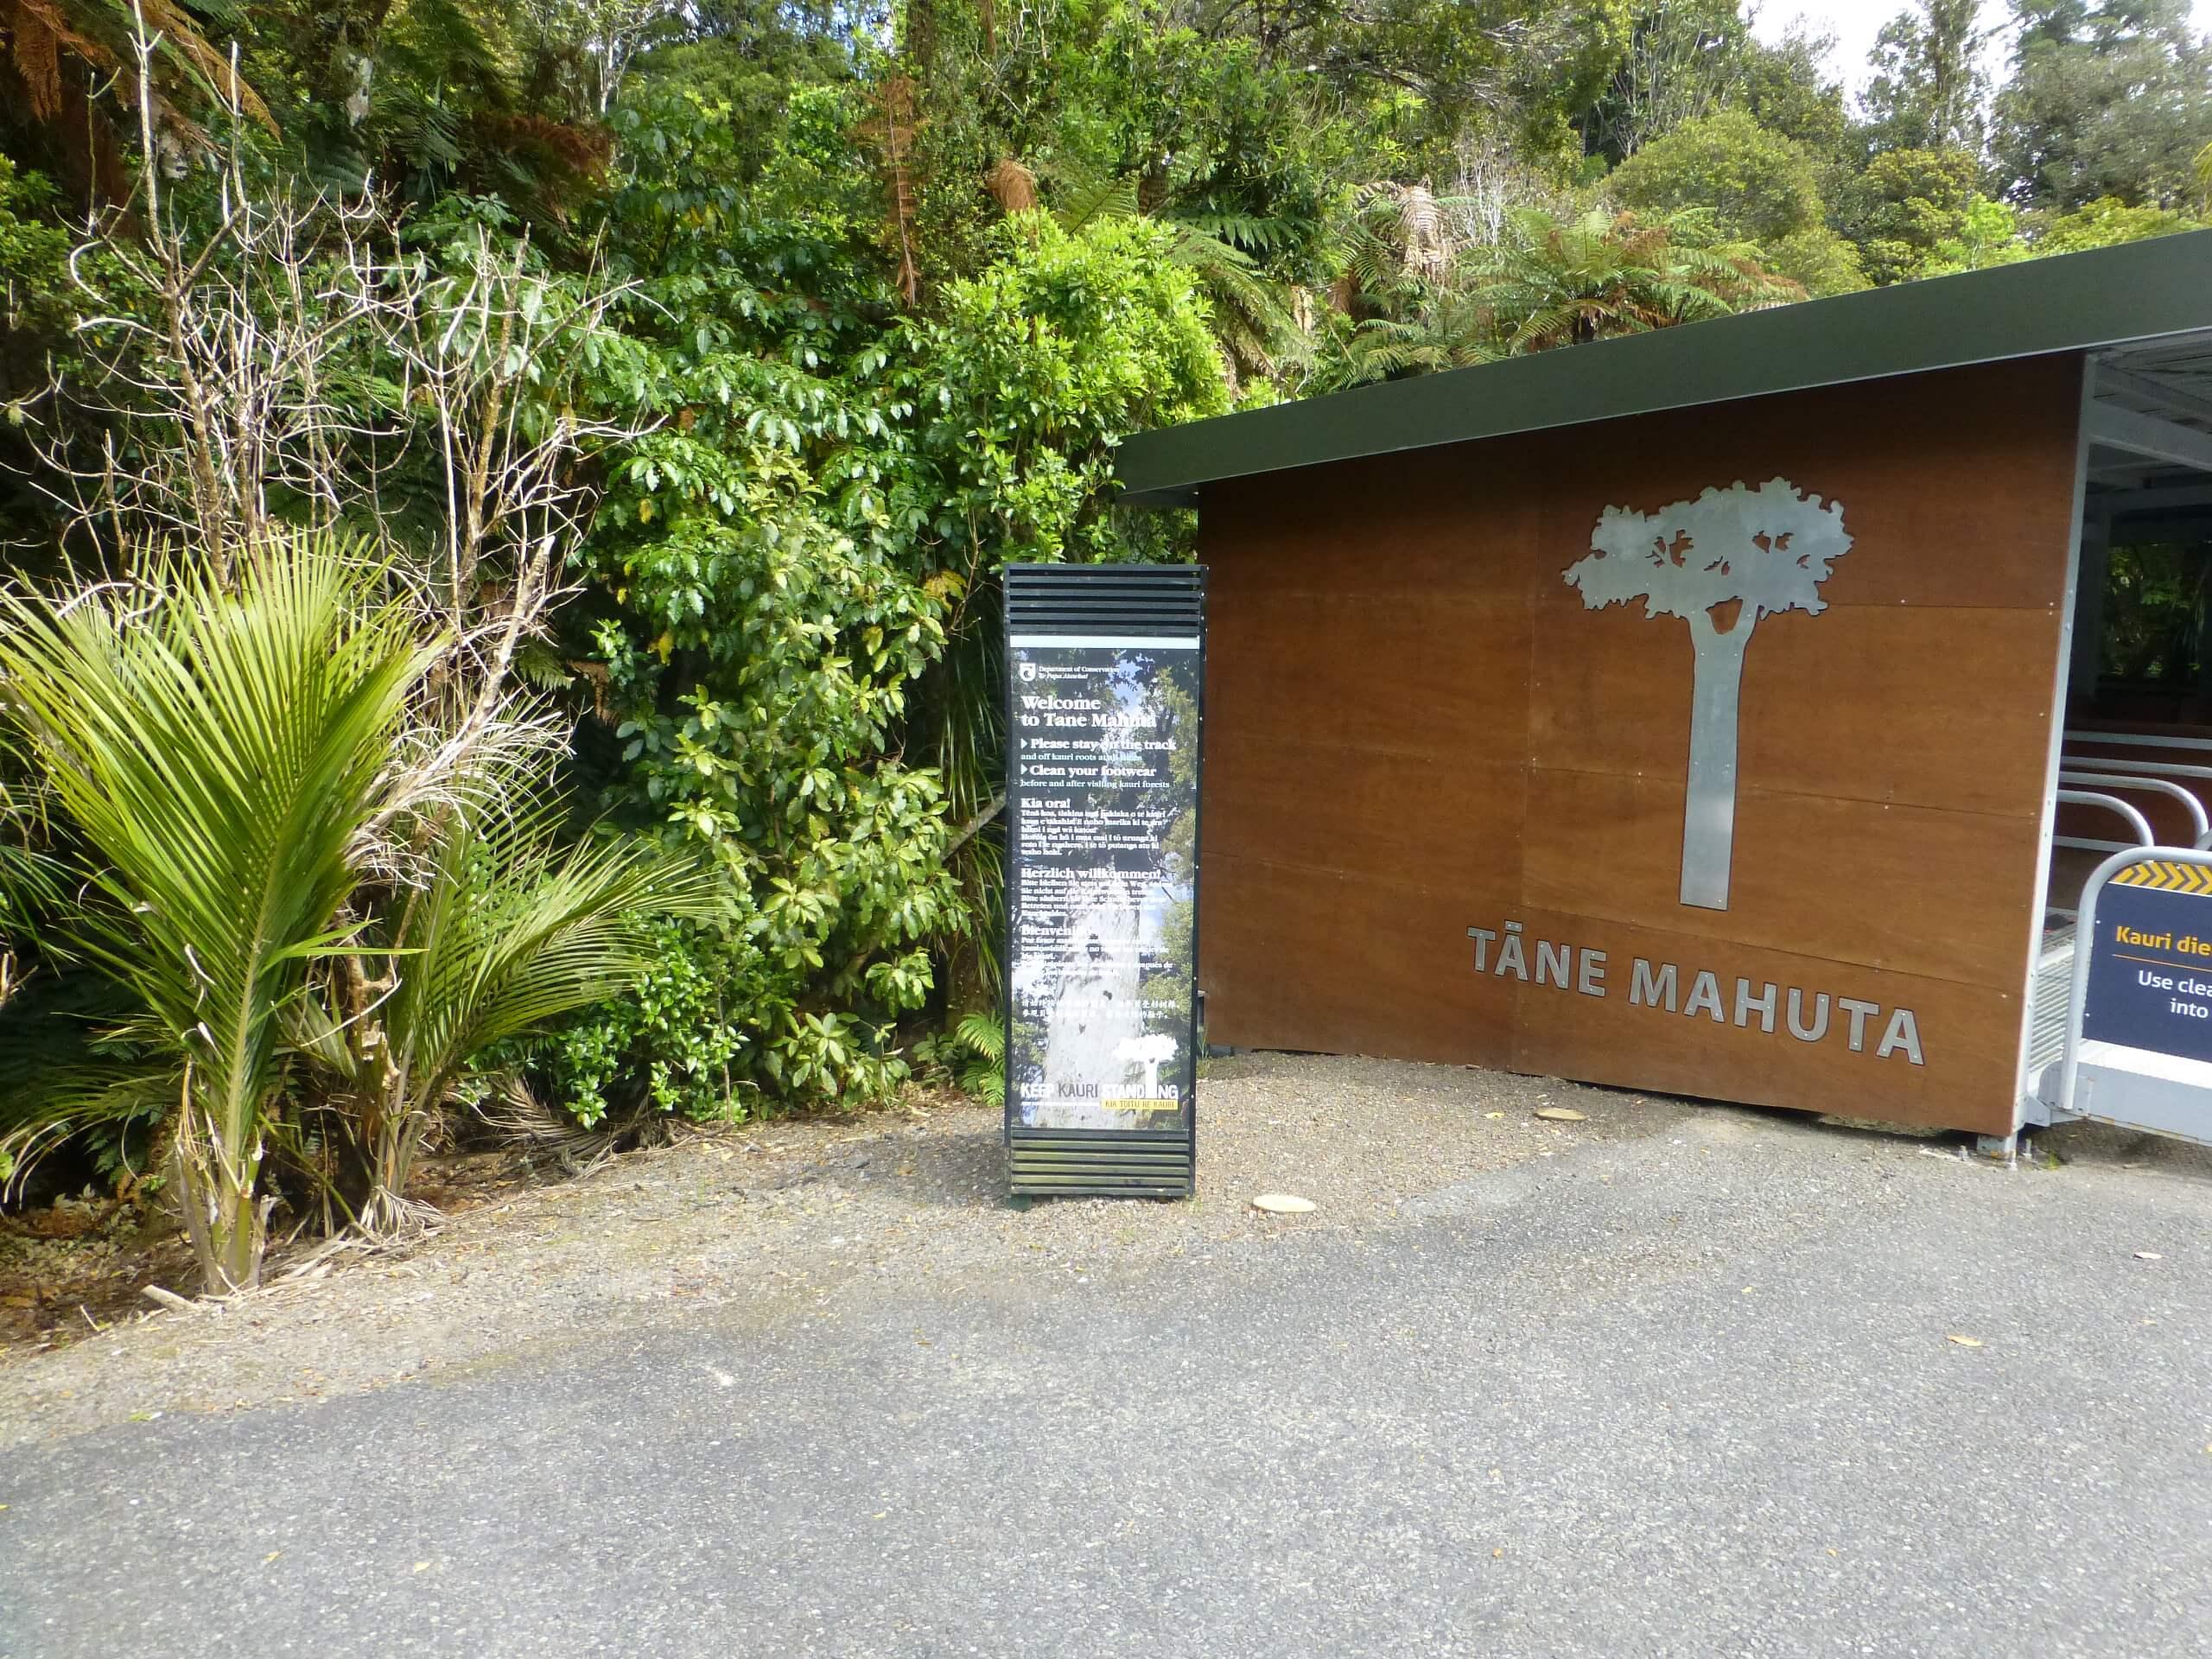 weit weg reisen, Waipoua Forest, Tane Mahuta 3